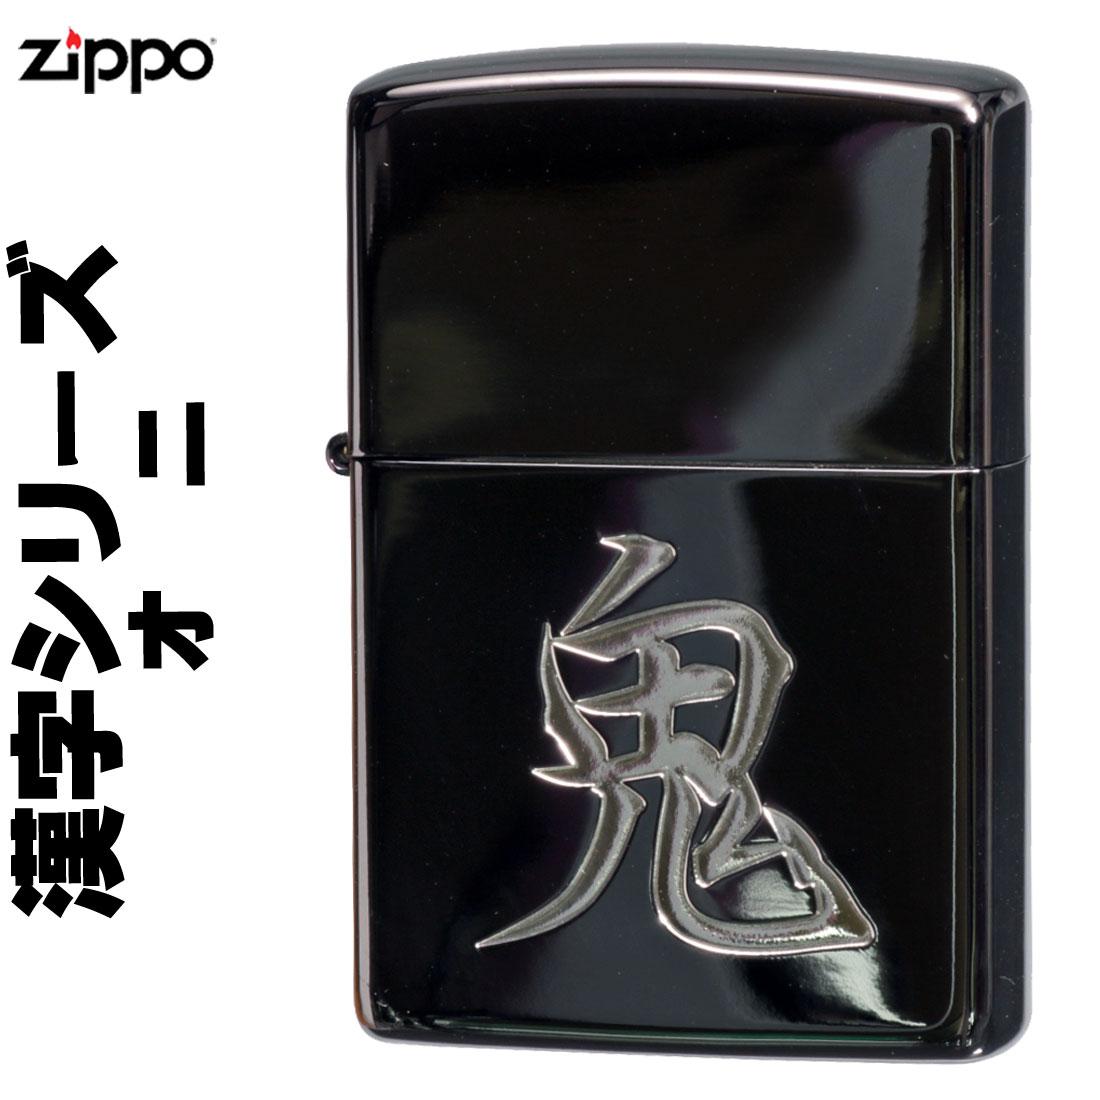 ZIPPO/鬼(オニ)漢字シリーズ 黒銀仕上げ画像